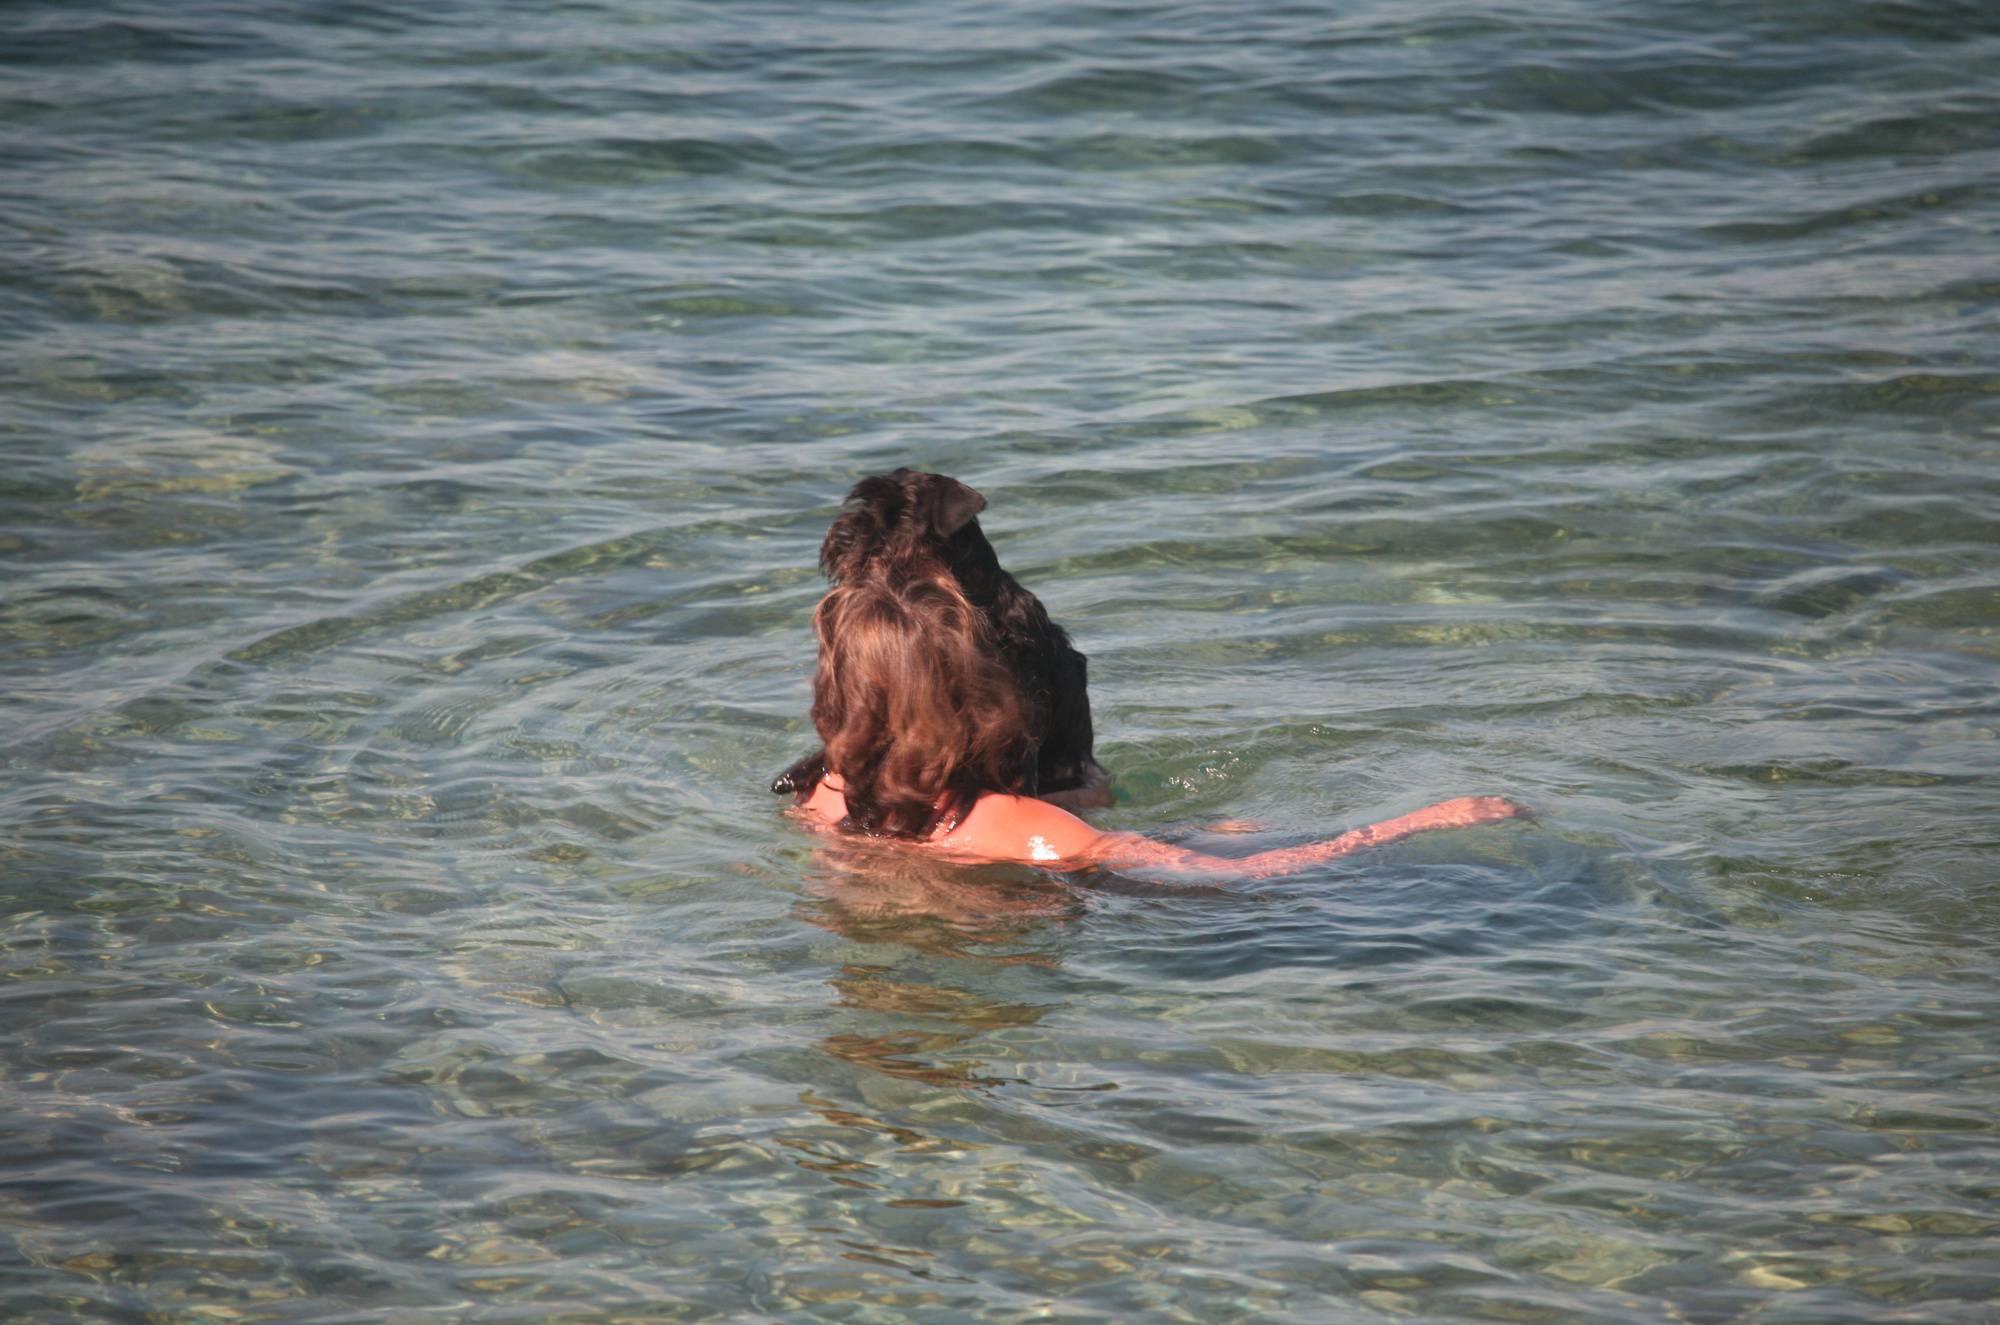 Nudist Photos Crete Dog-Bathing Woman - 1